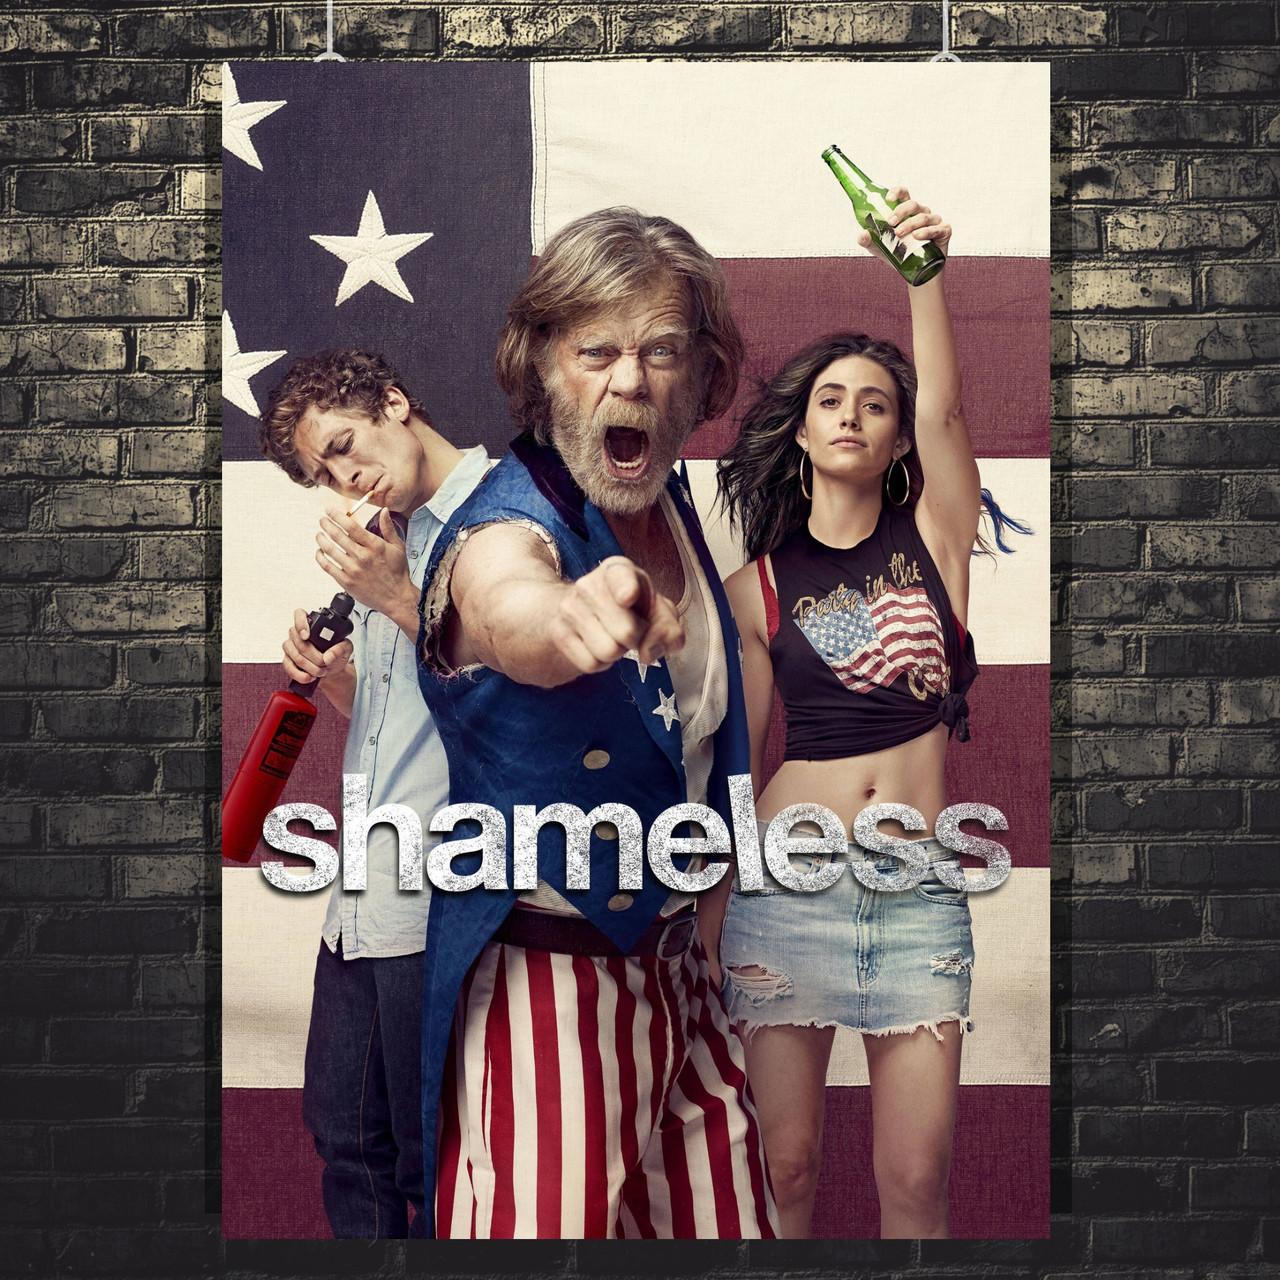 Постер Shameless, Бесстыжие, сериал. Размер 60x42см (A2). Глянцевая бумага